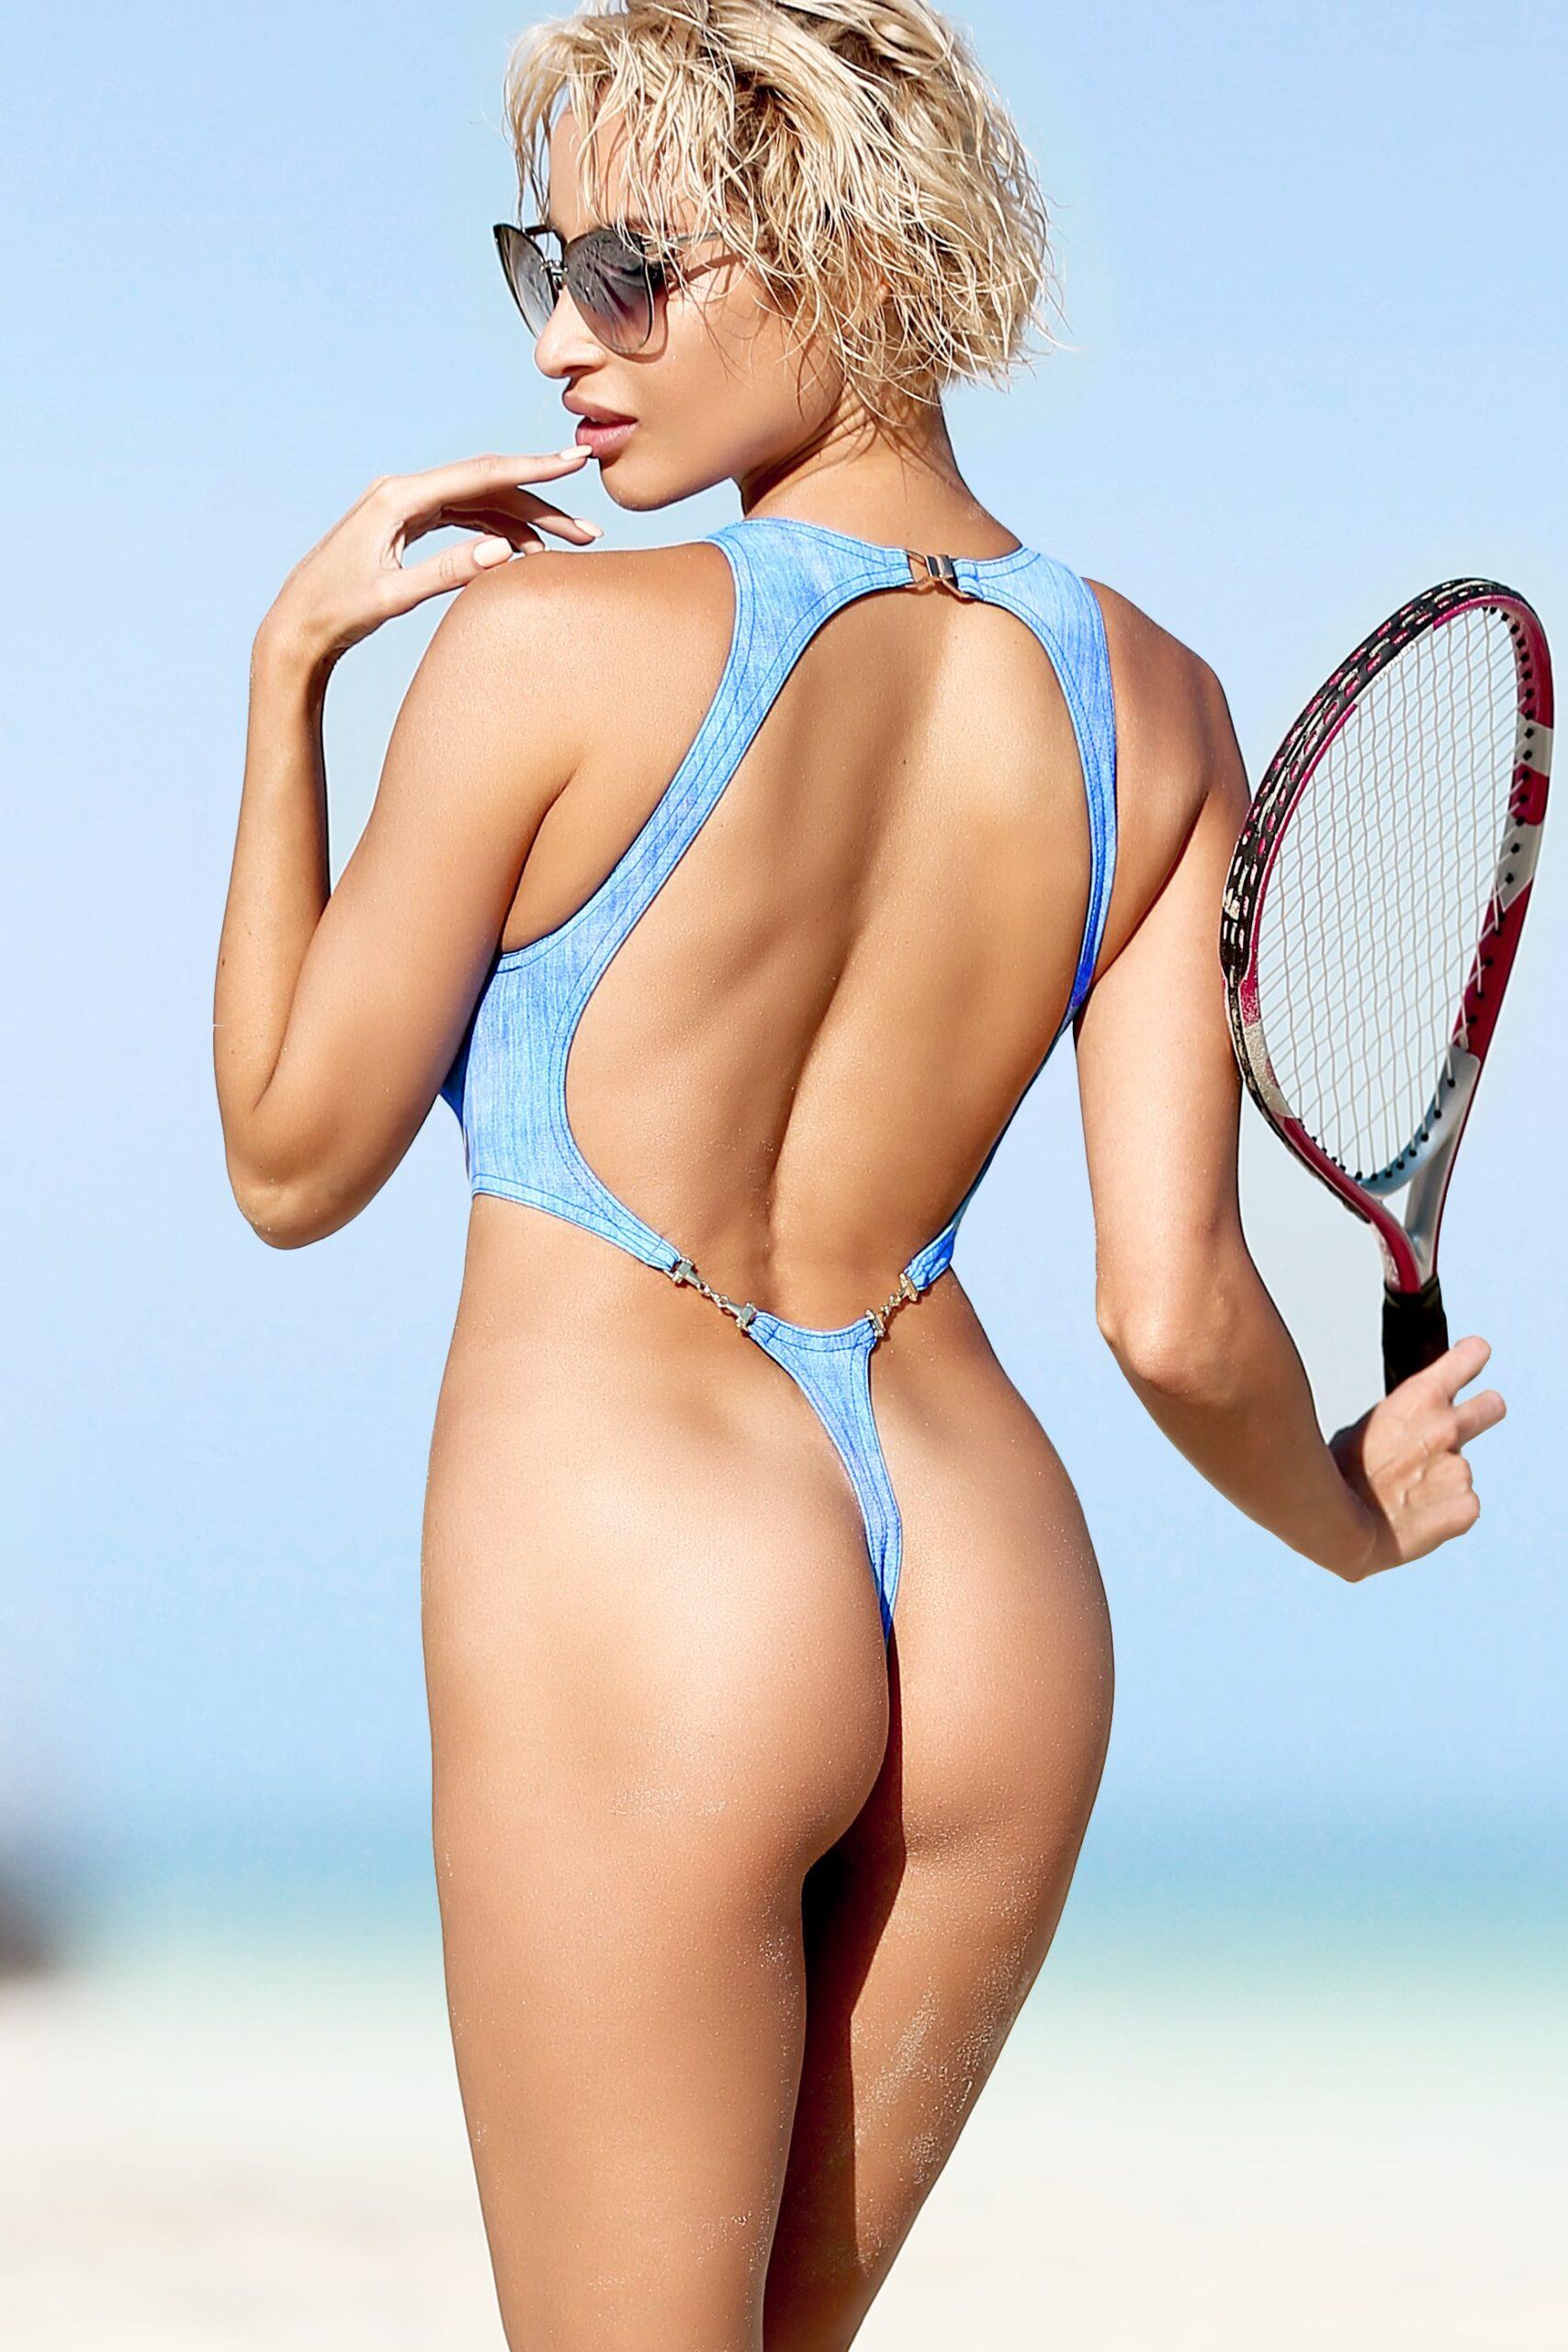 Sexy thong one piece swimsuit High neck bathing suit Extreme cut leg monokini Denim print bodysuit Designer swimwear Exotic dancewear 2020